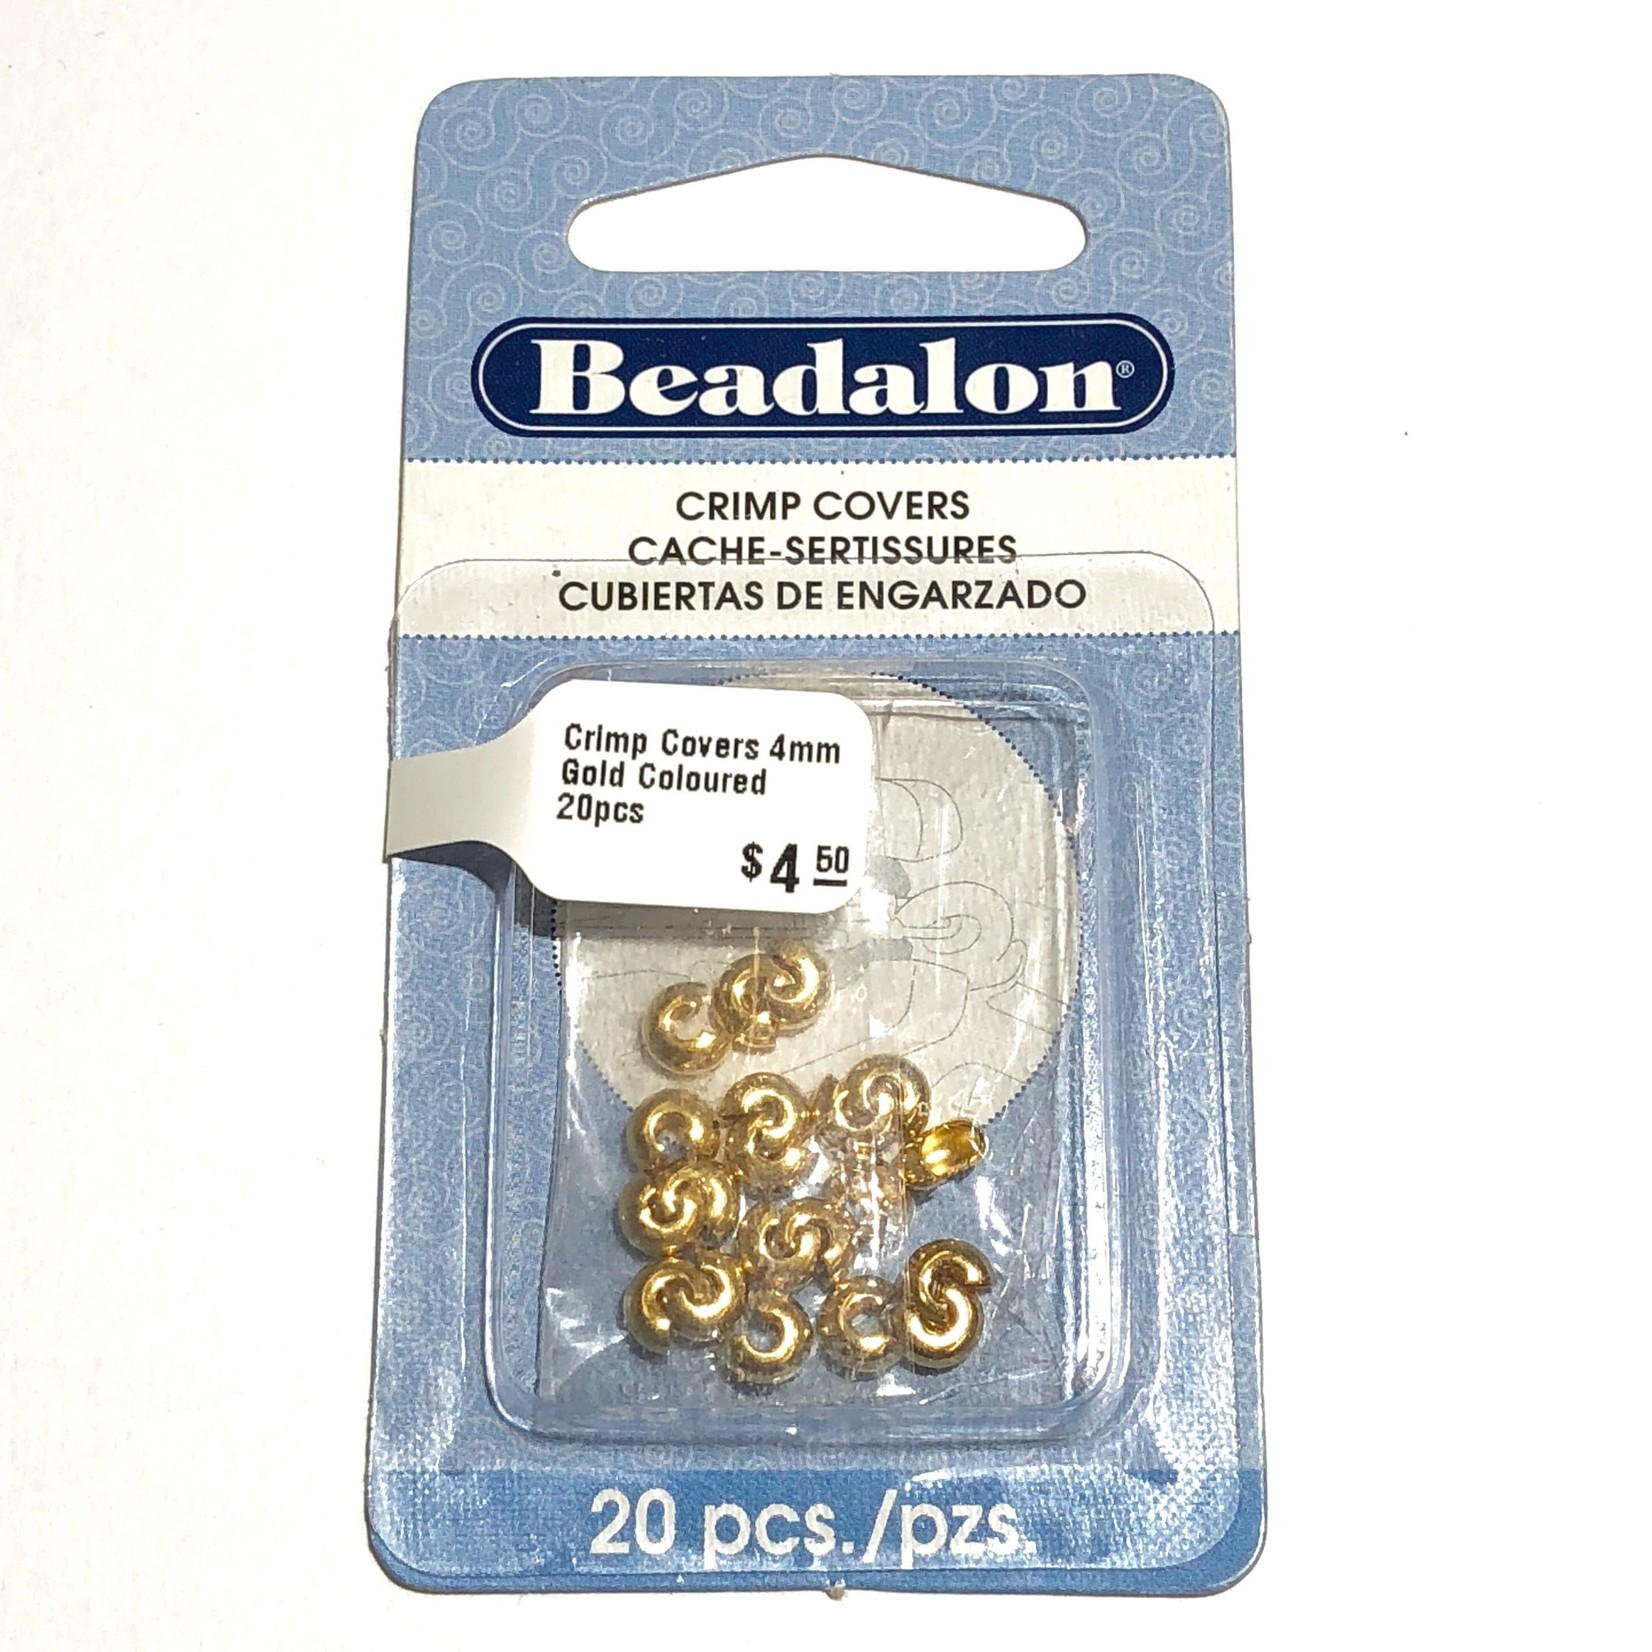 Crimp Covers 4mm Gold Coloured 20pcs